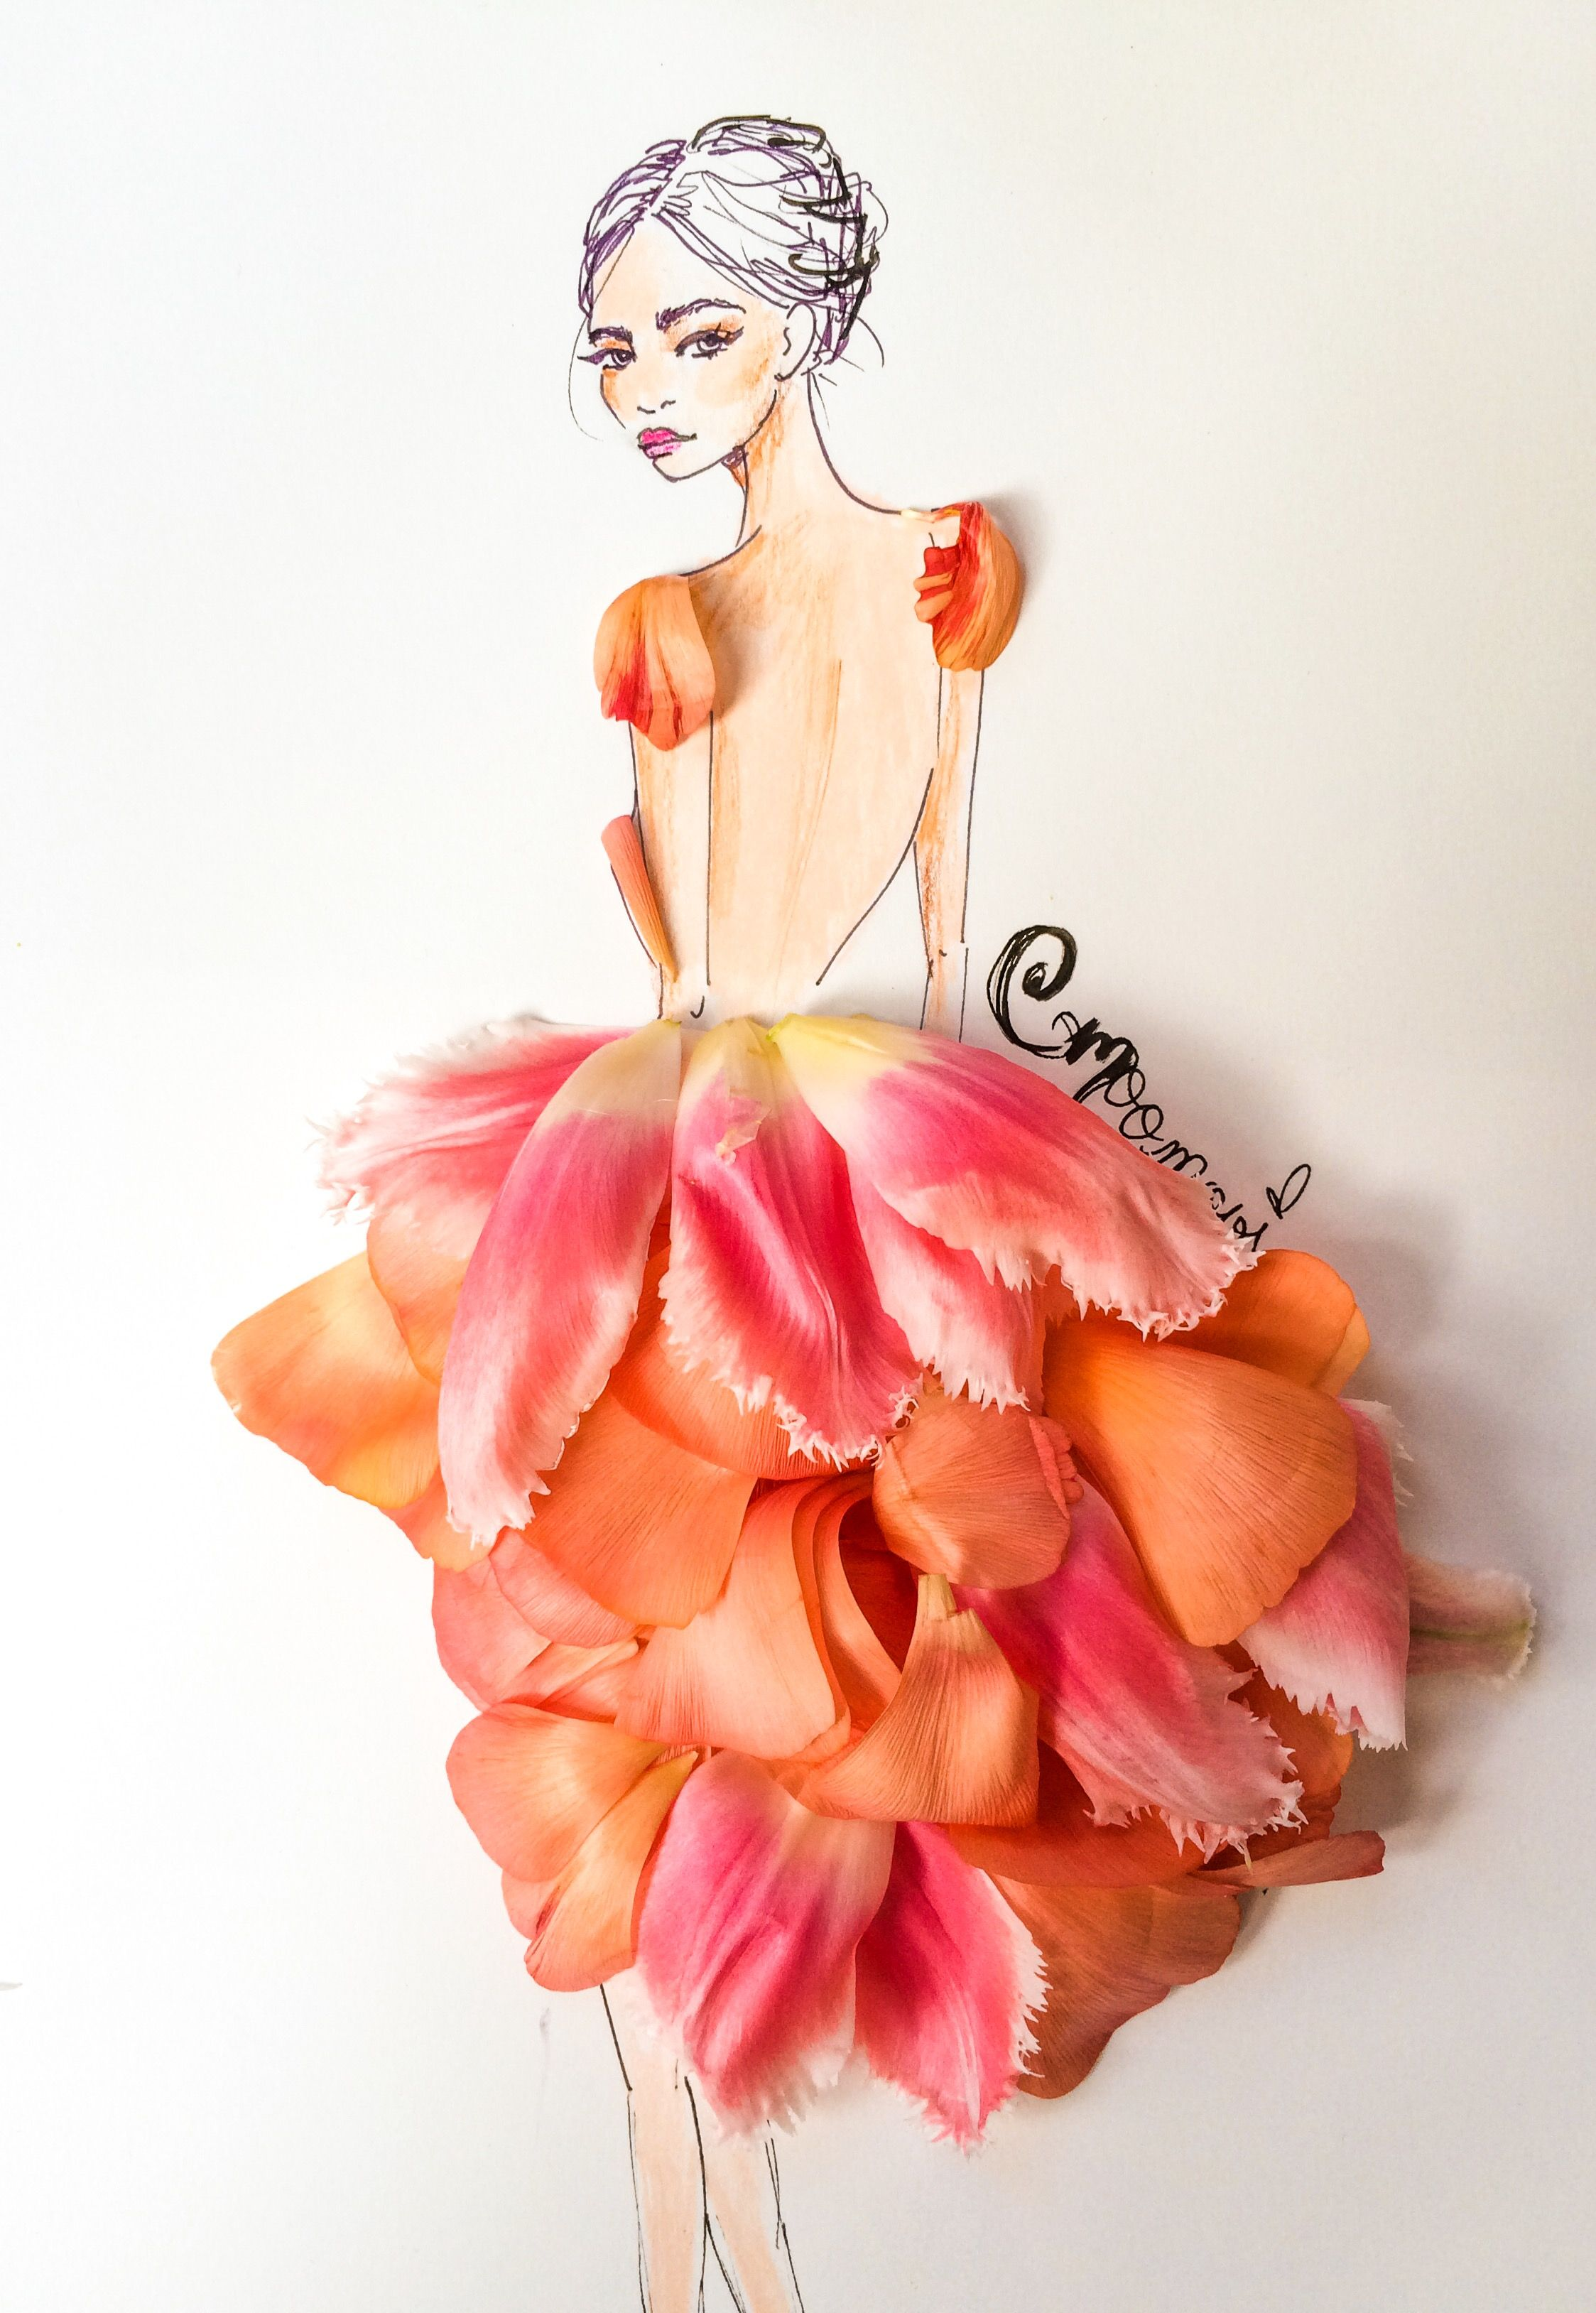 Floral Fashion Illustration Fashion Meets Nature Pinterest Floral Fashion Fashion